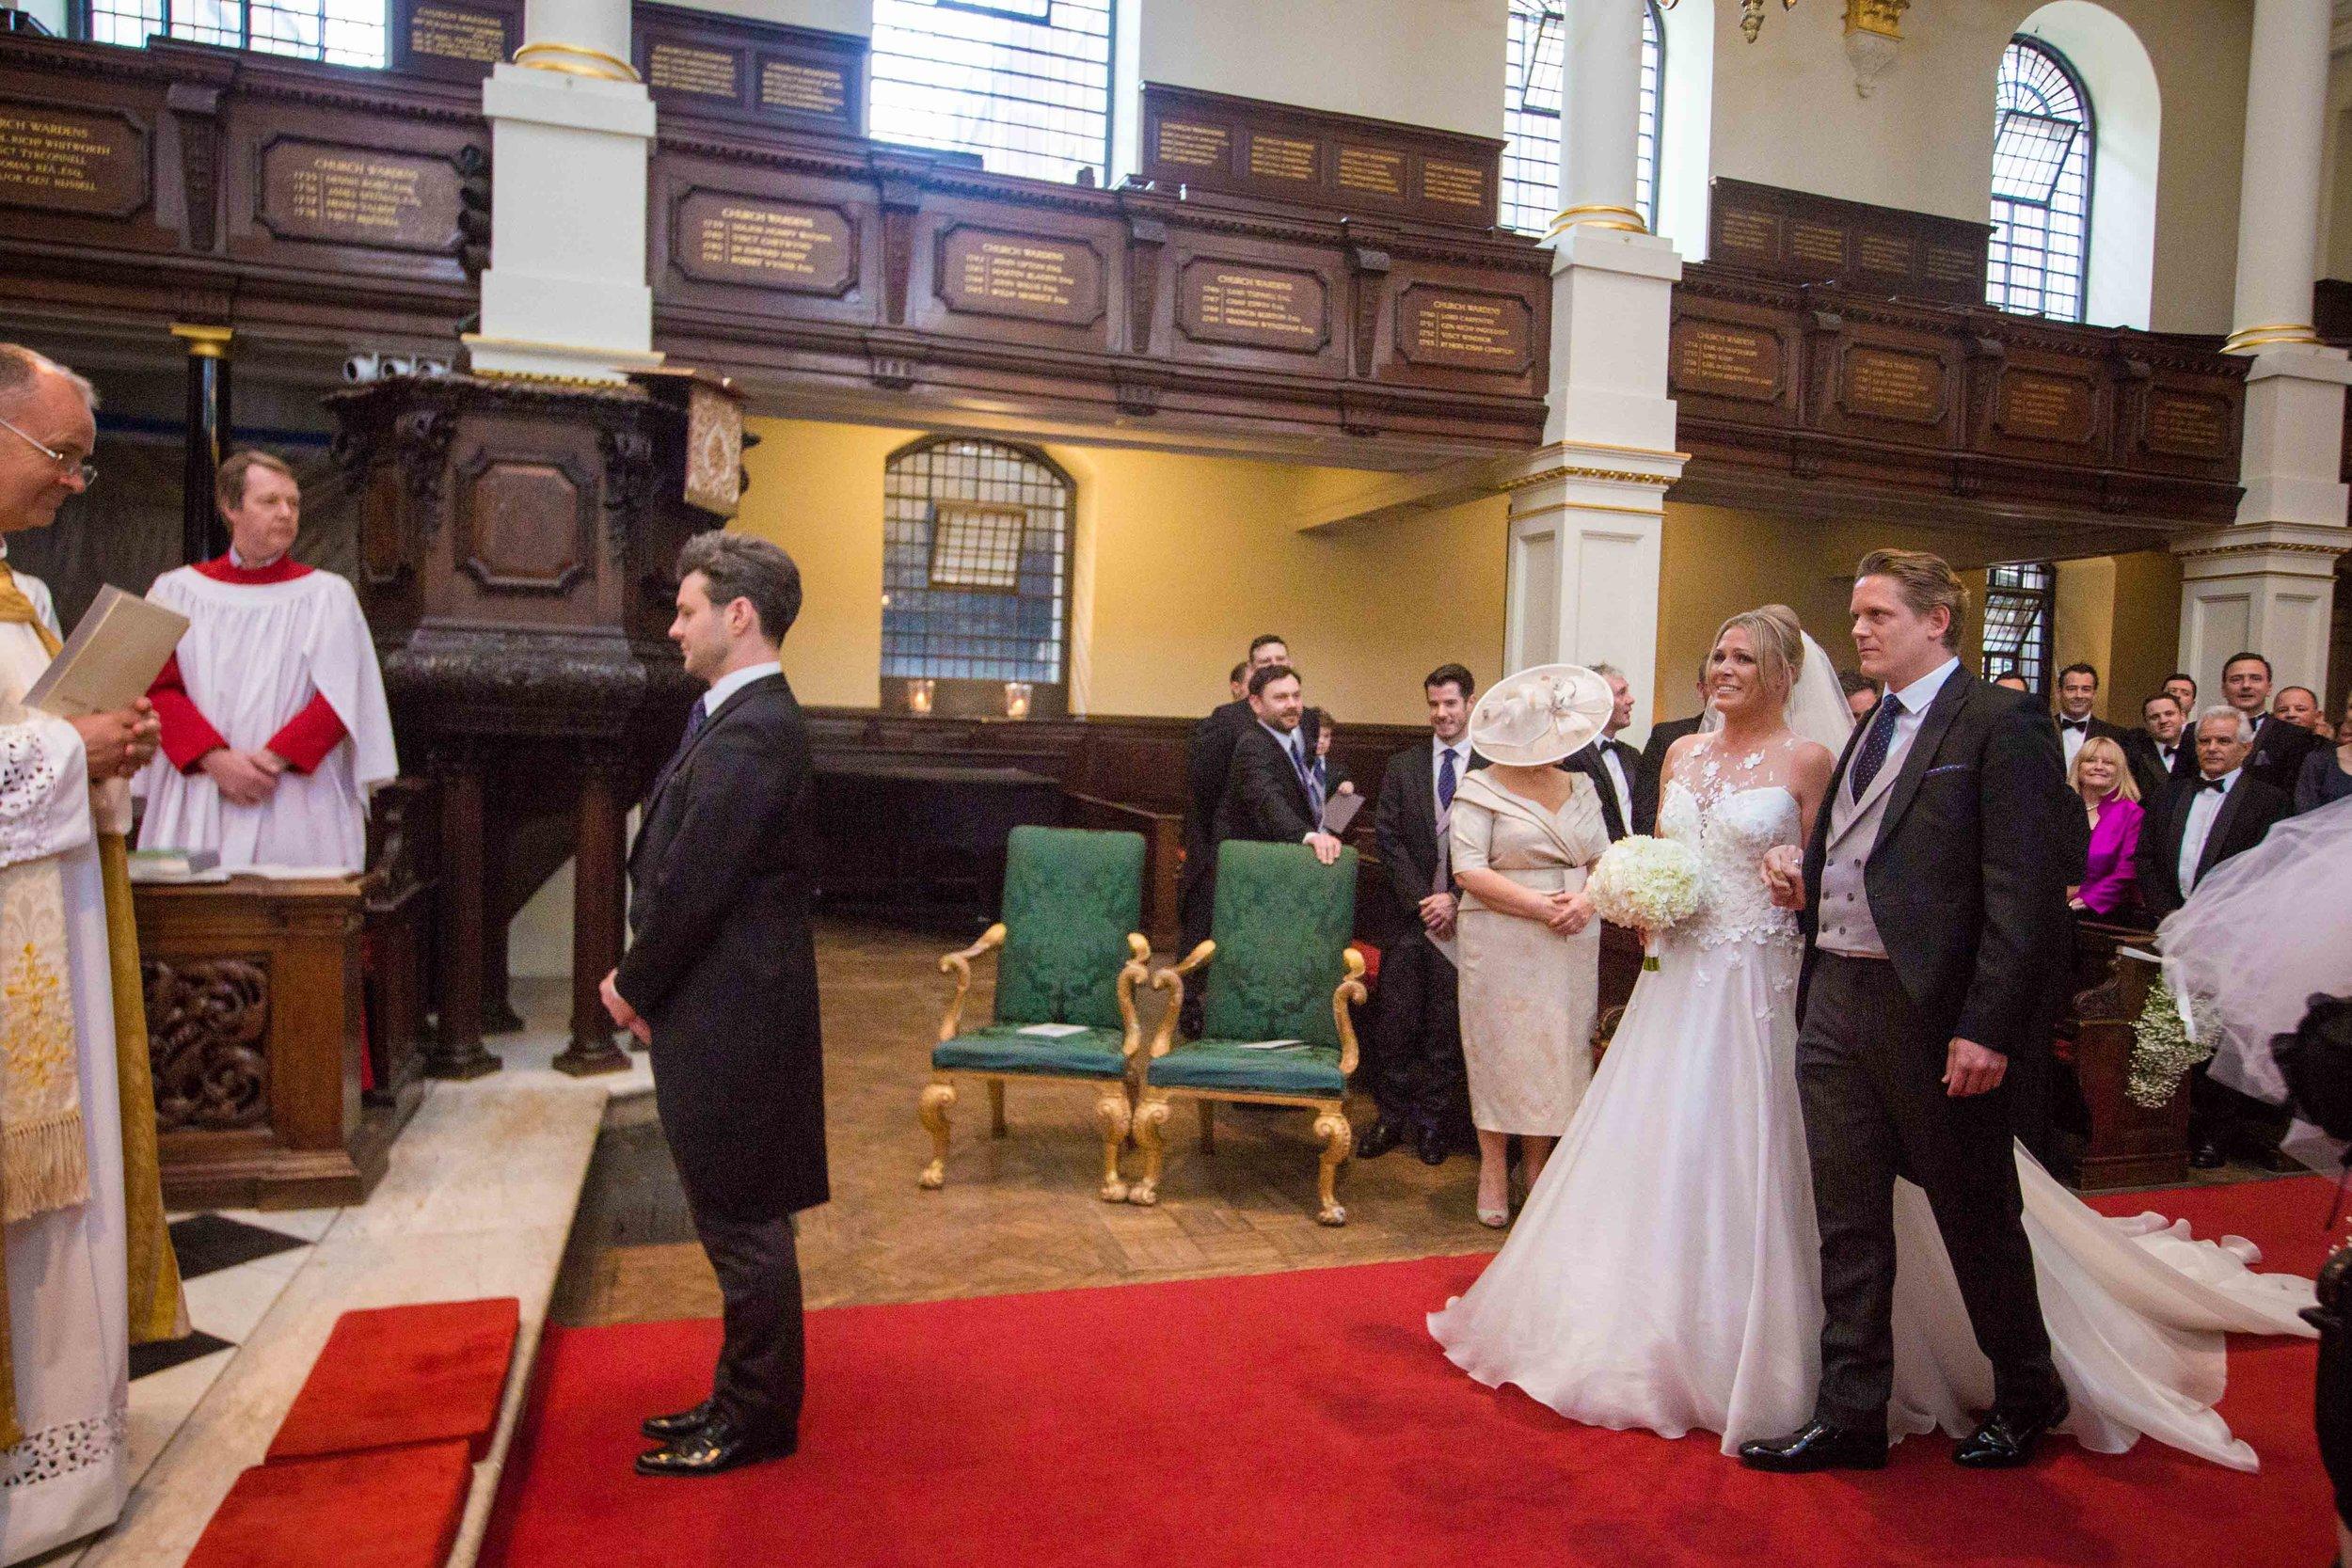 claridges-hotel-wedding-photographer-london-mayfair-natalia-smith-photography-56.jpg